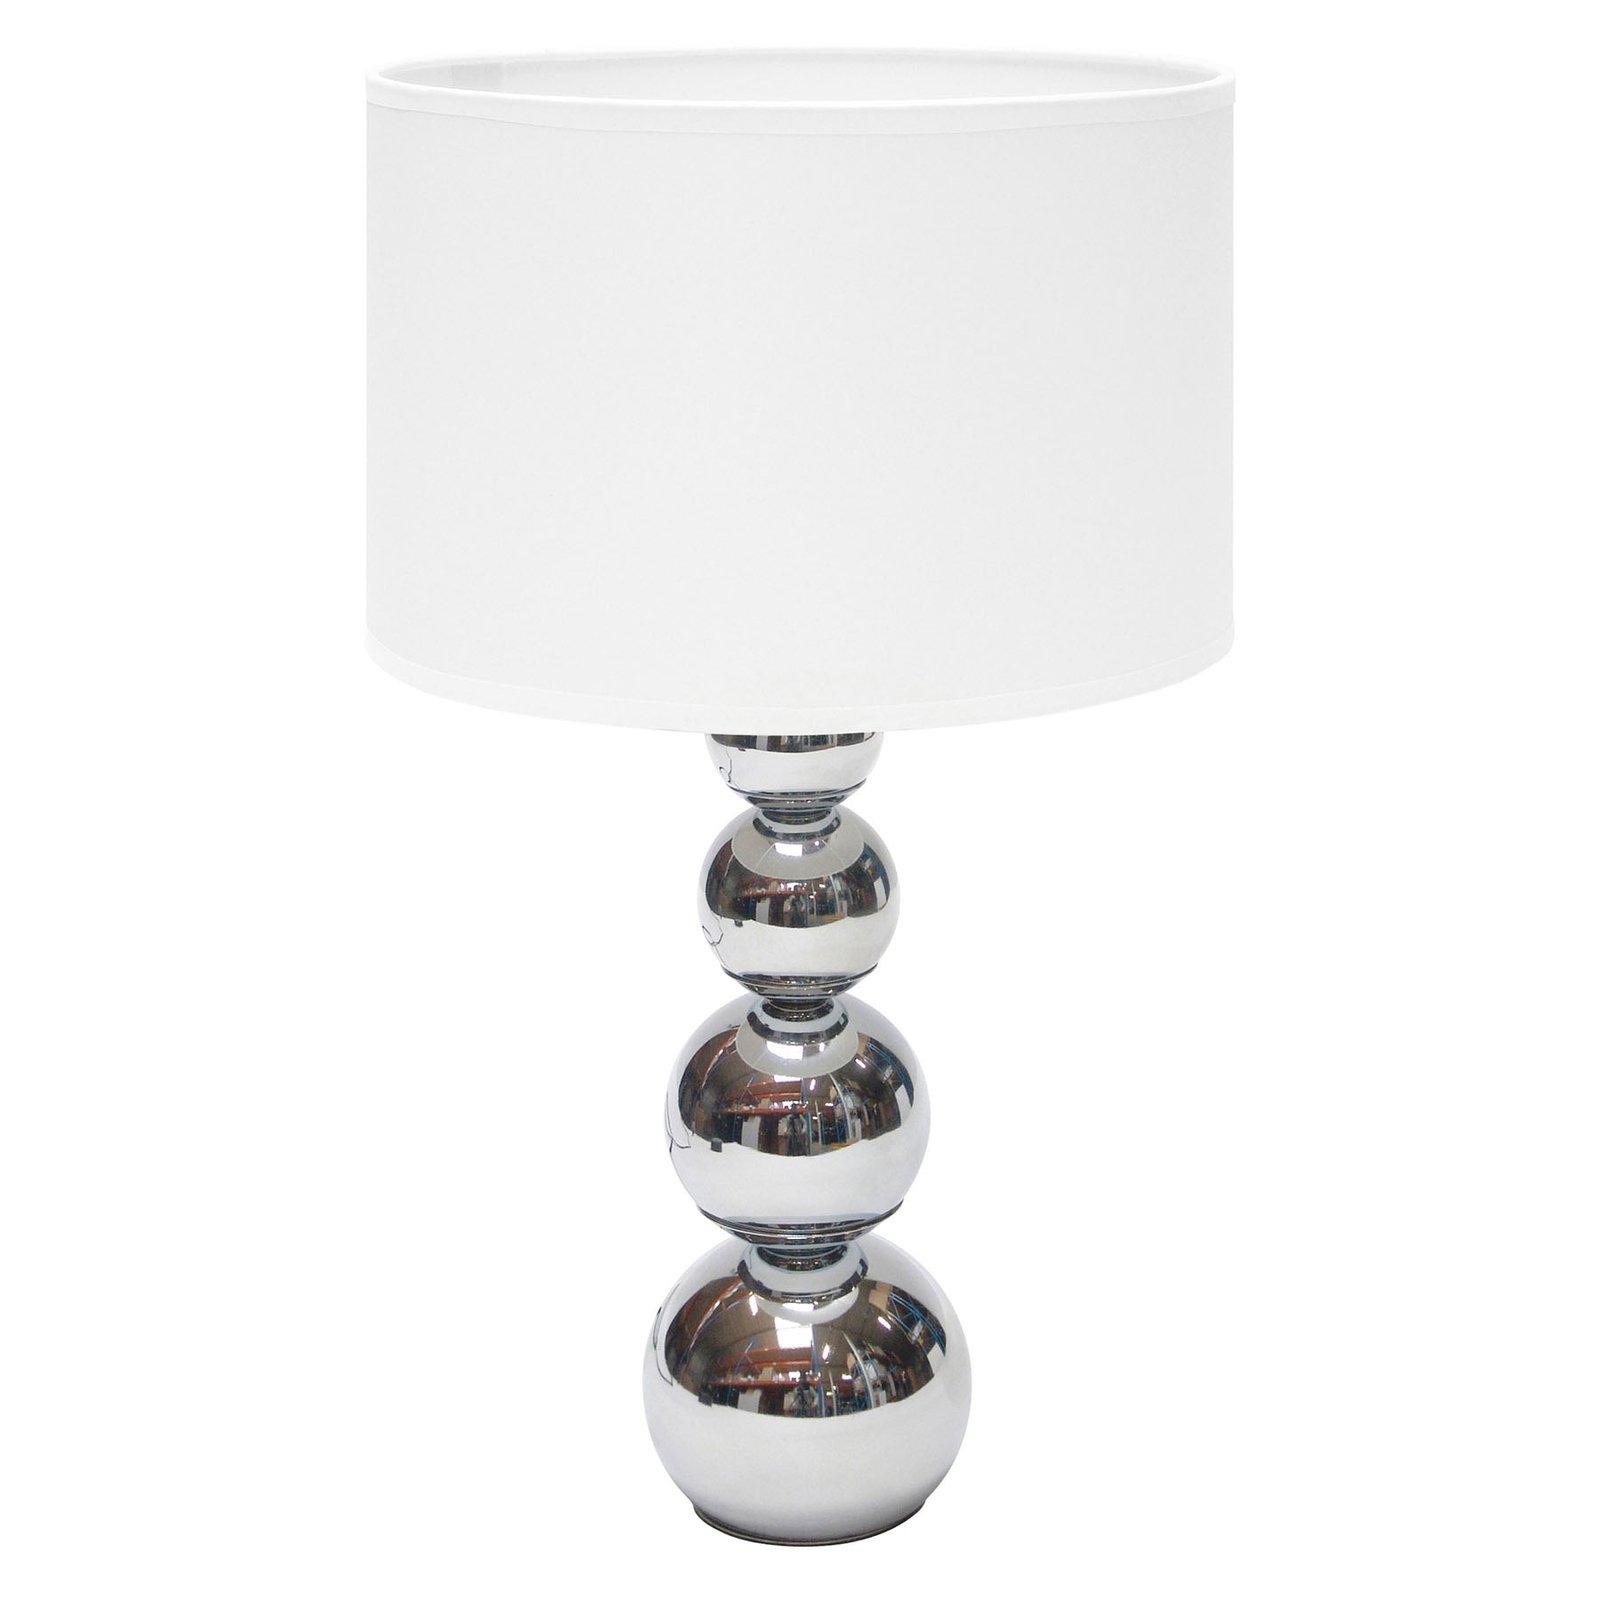 Bordlampe Mandy, berøringsfunksjon, hvit